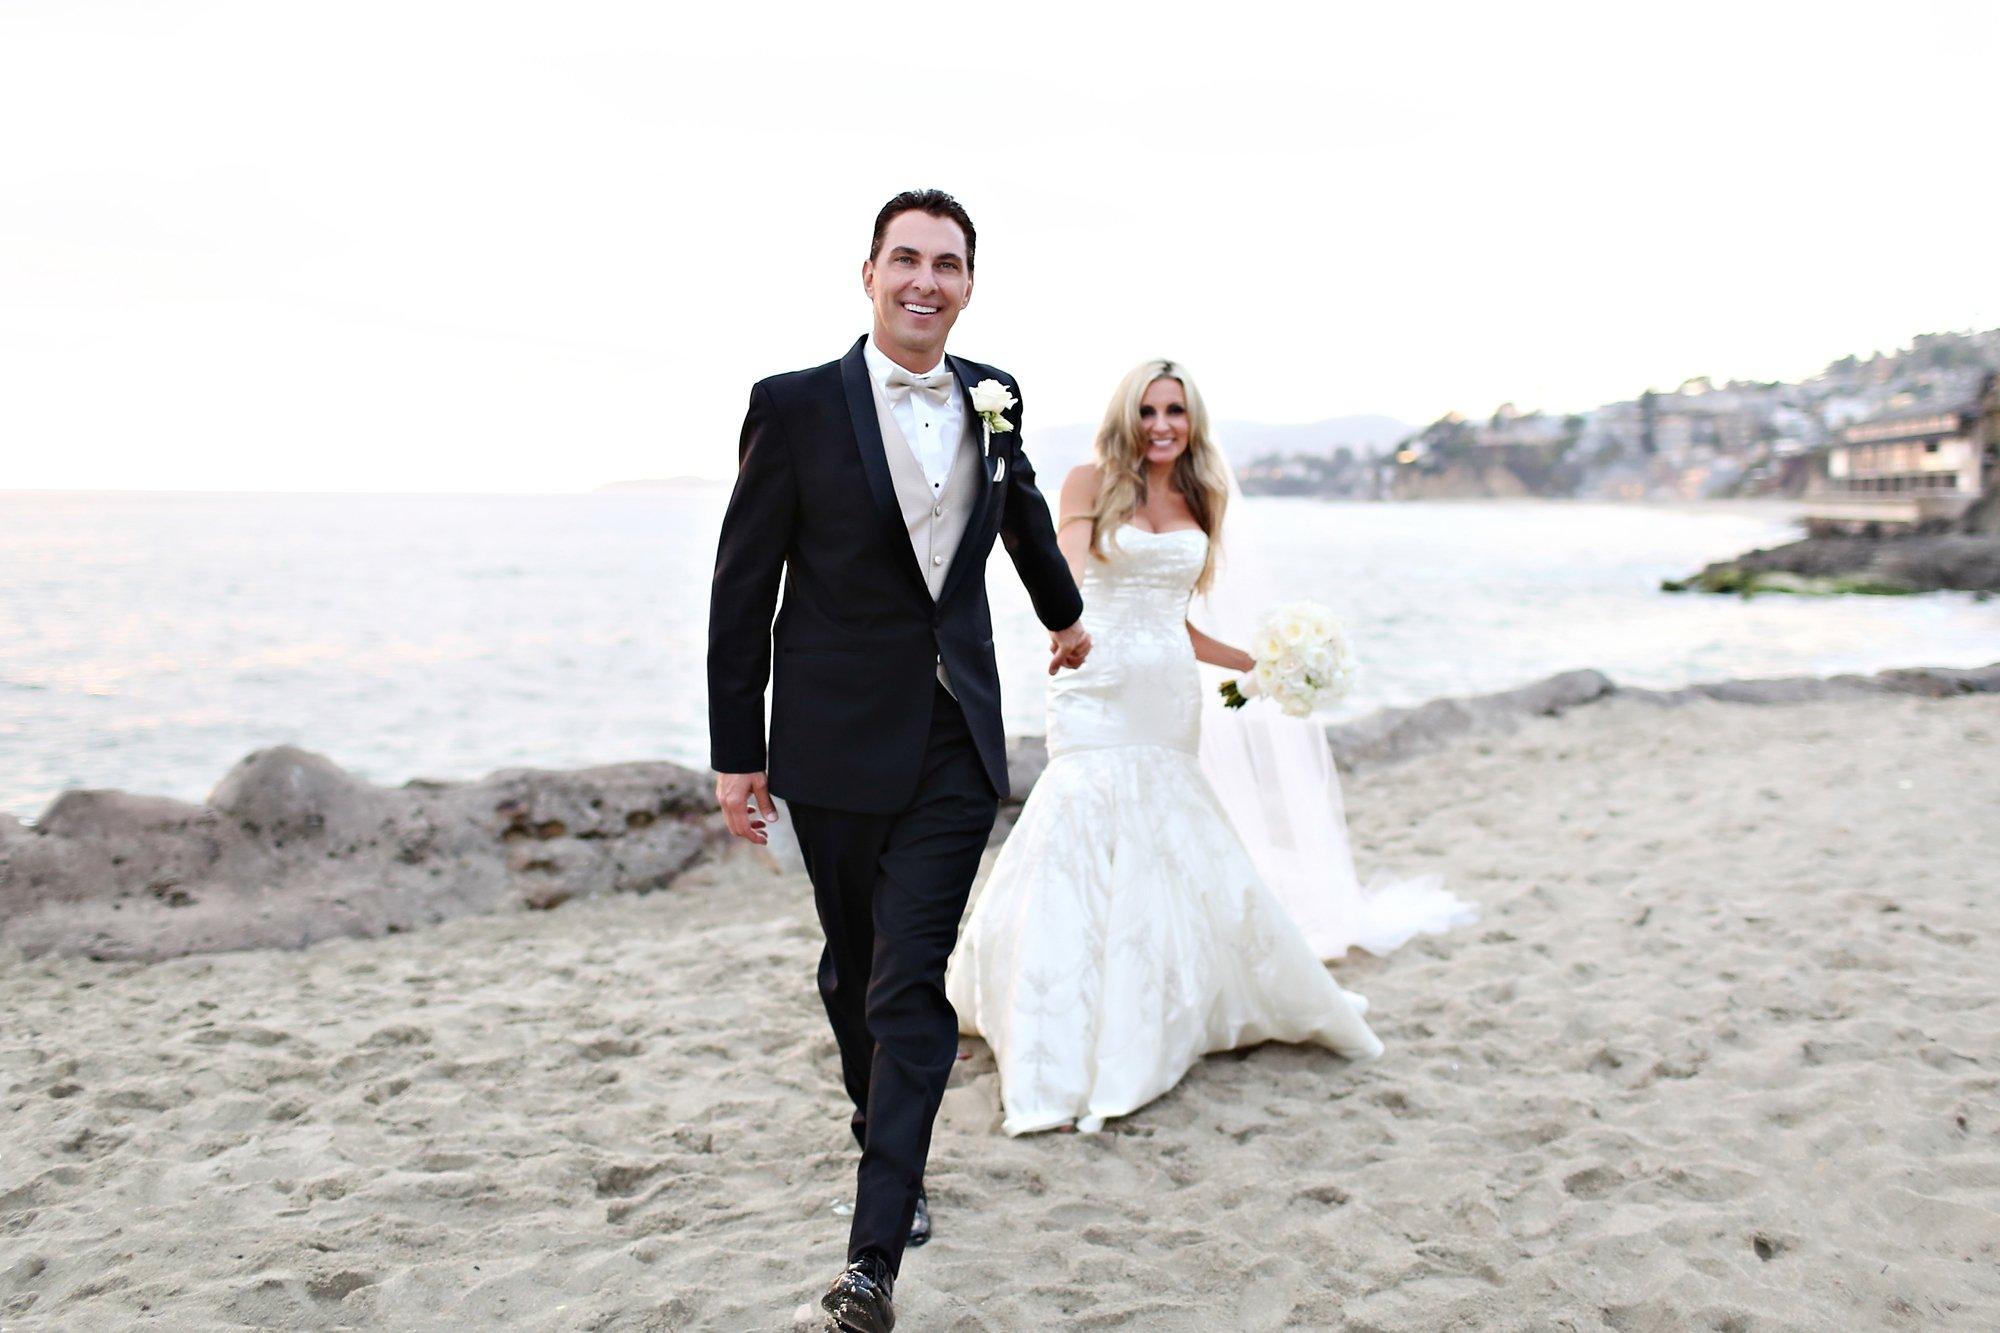 Laguna Beach Montage wedding Glenn and Michelle-Carats and cake resize-0013.jpg